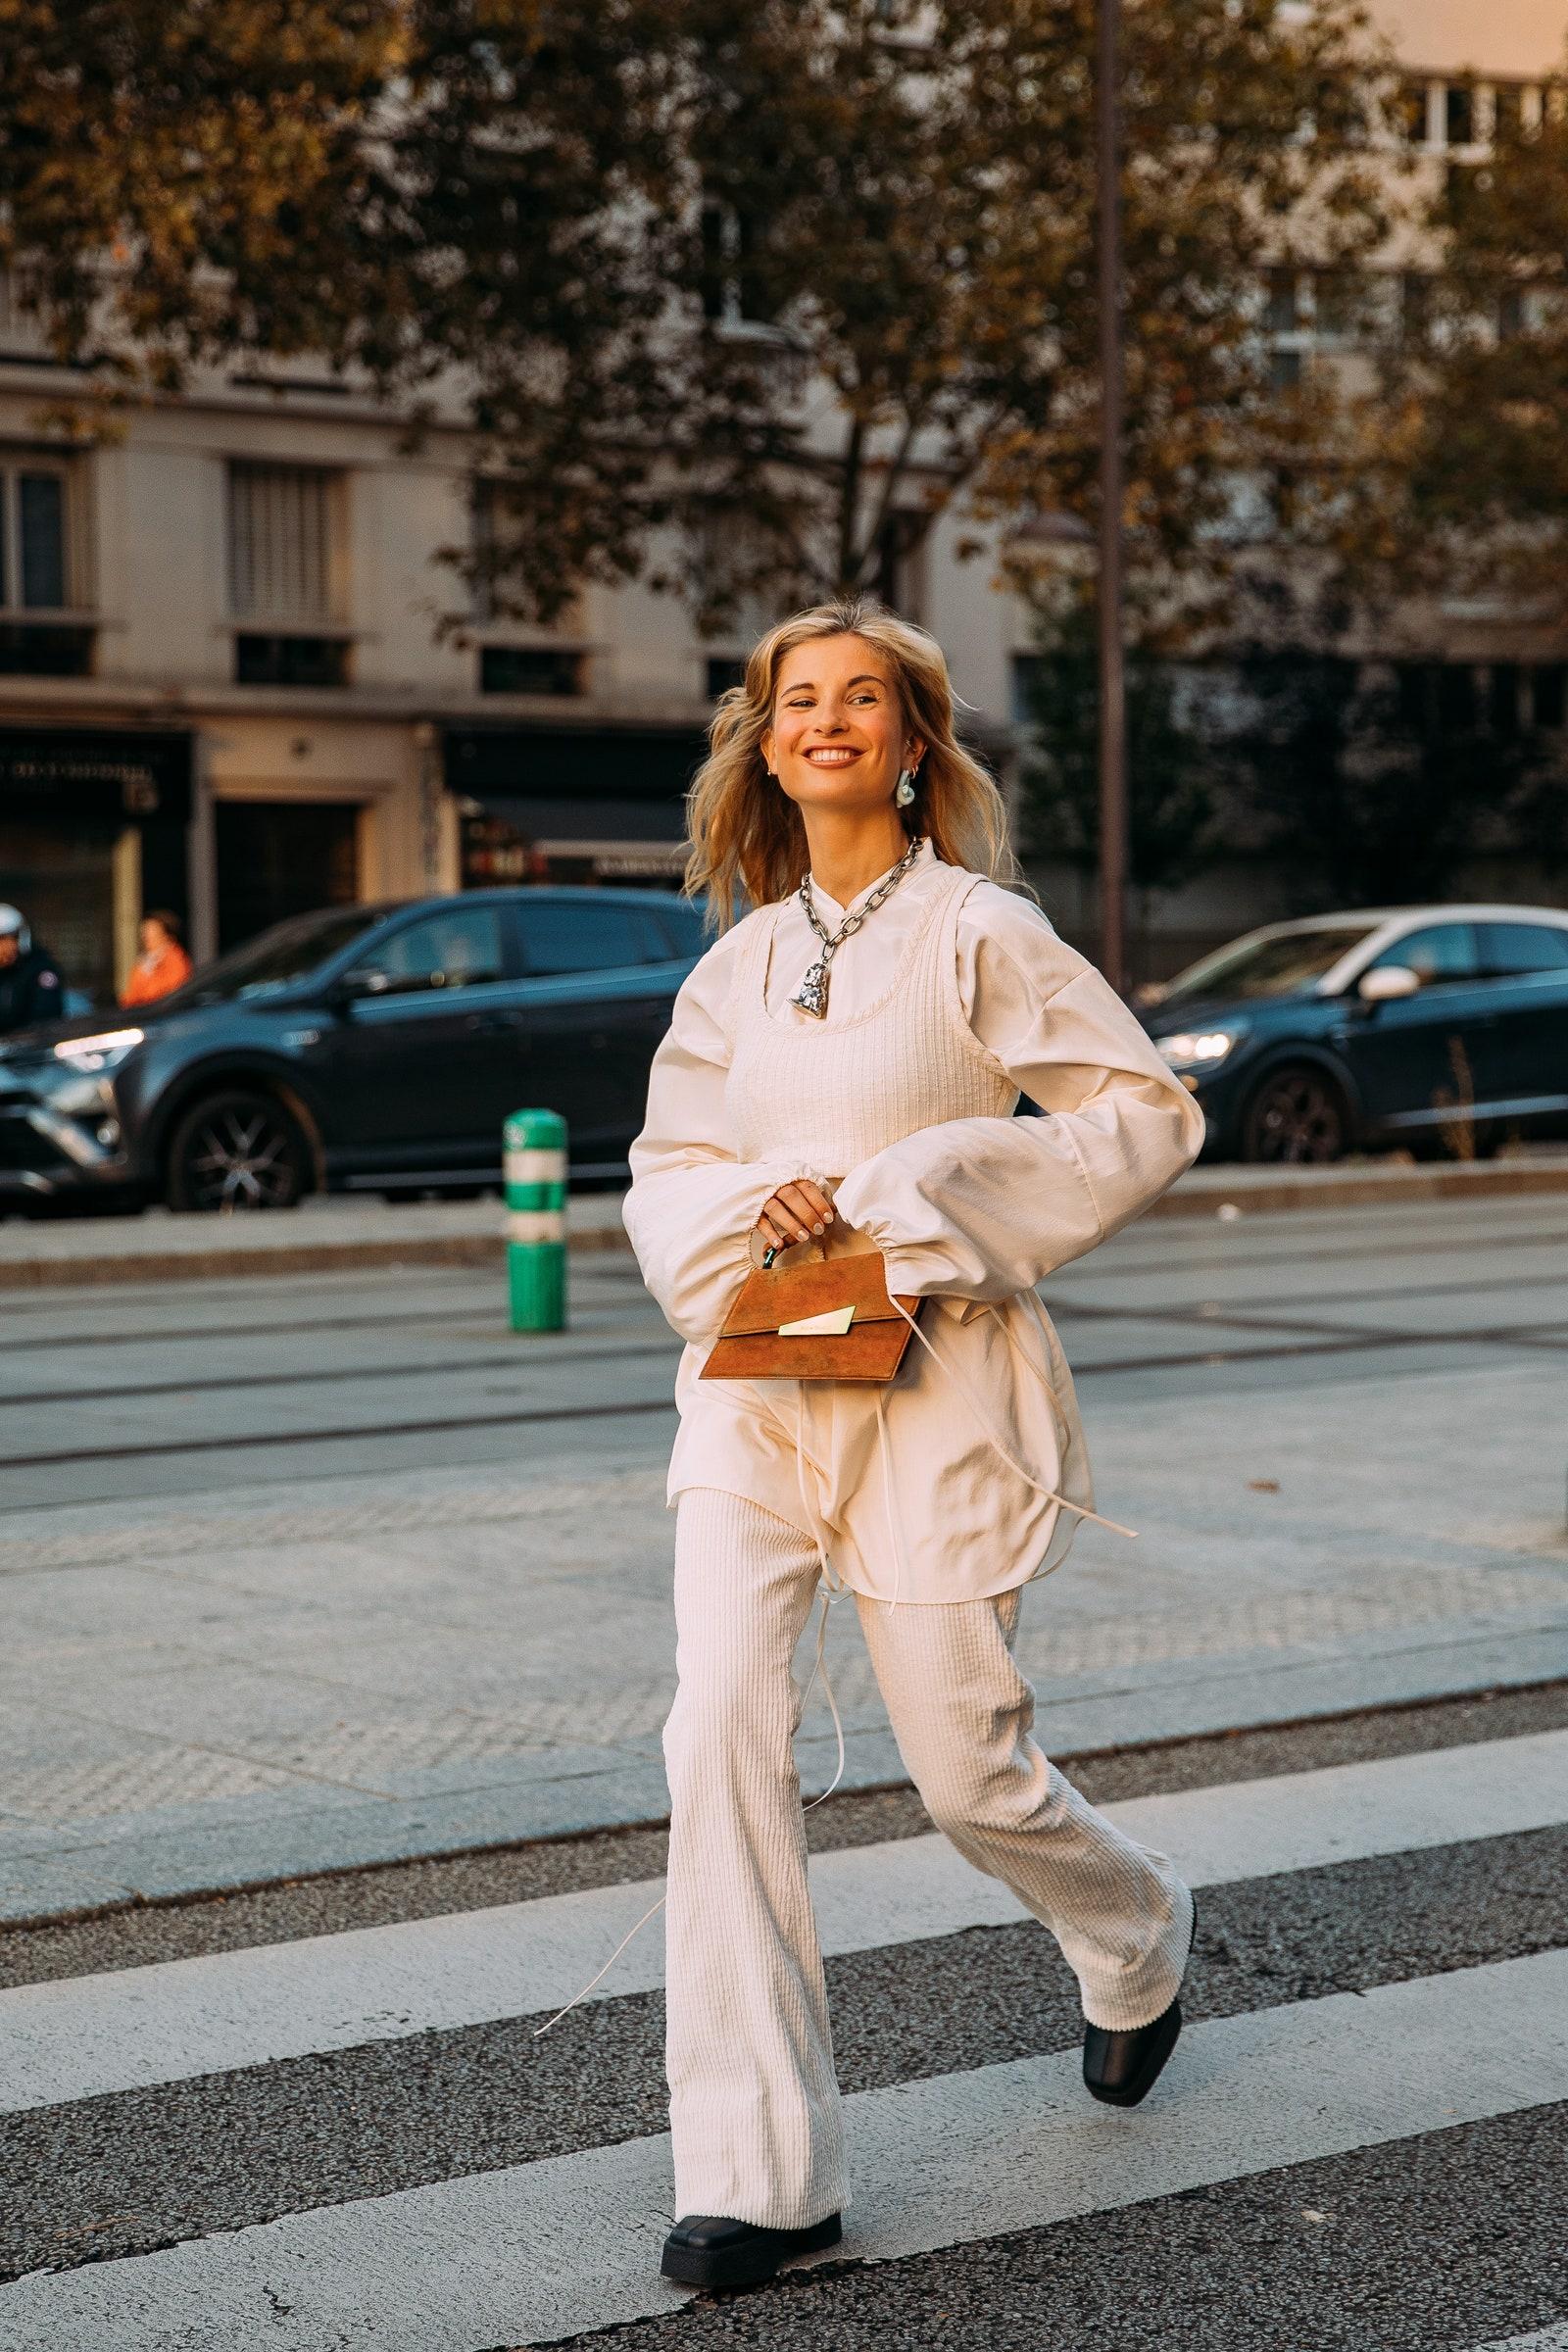 paris-street-style-40-163422210510374028863.jpeg